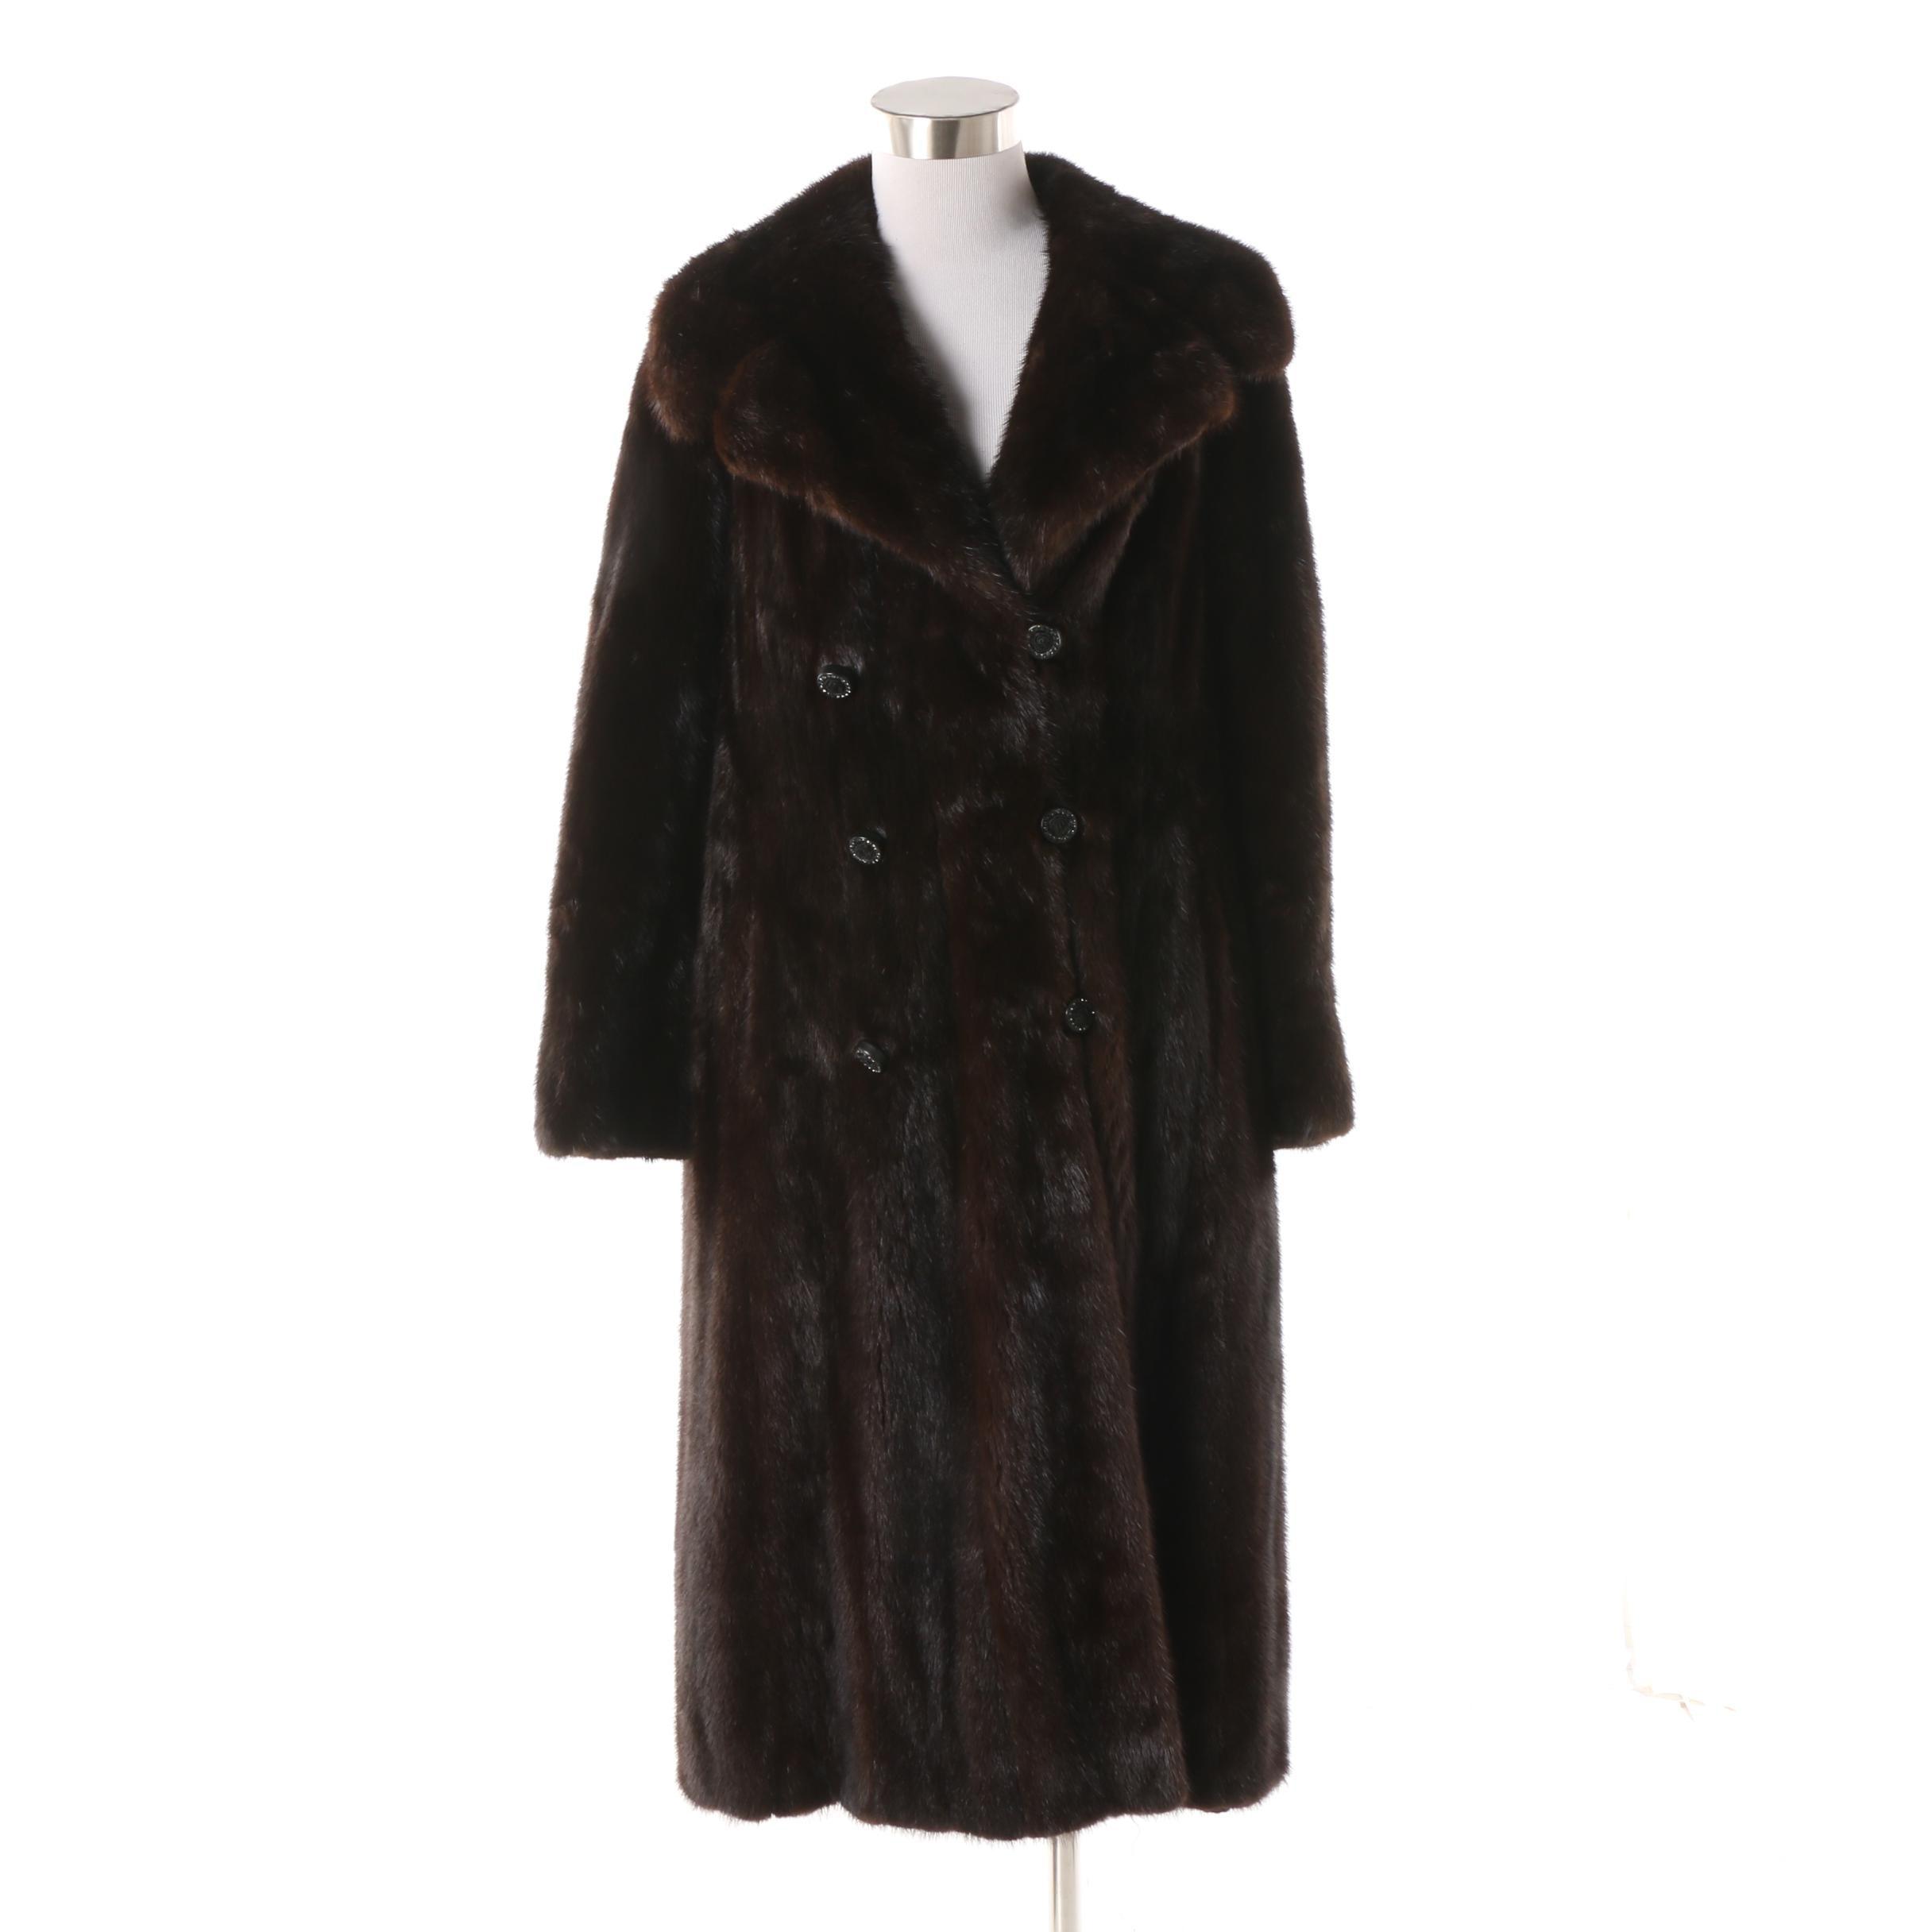 Women's Vintage Double-Breasted Ranch Mink Fur Dress Coat